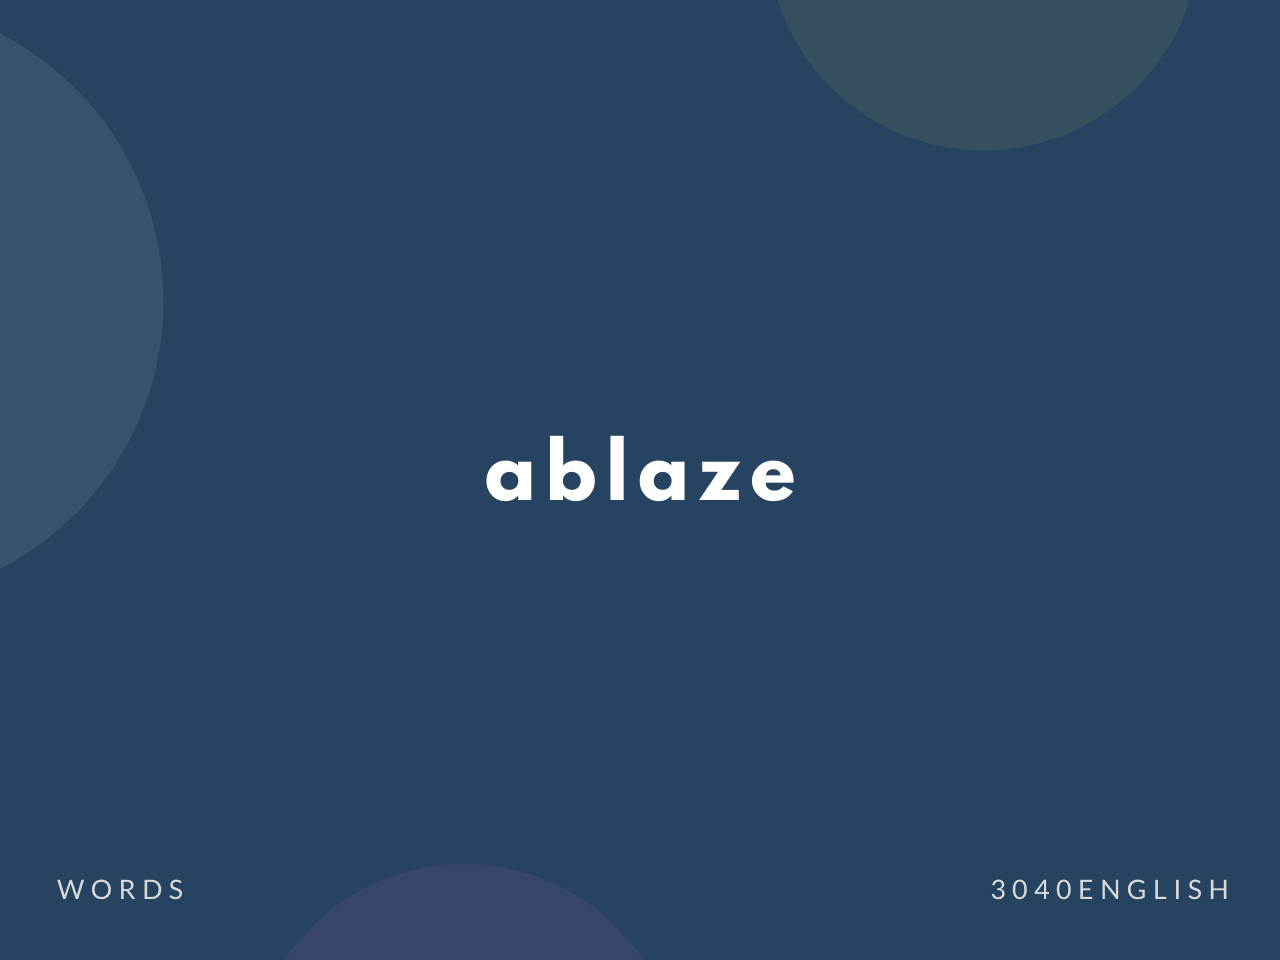 ablaze の意味と簡単な使い方【音読用例文あり】